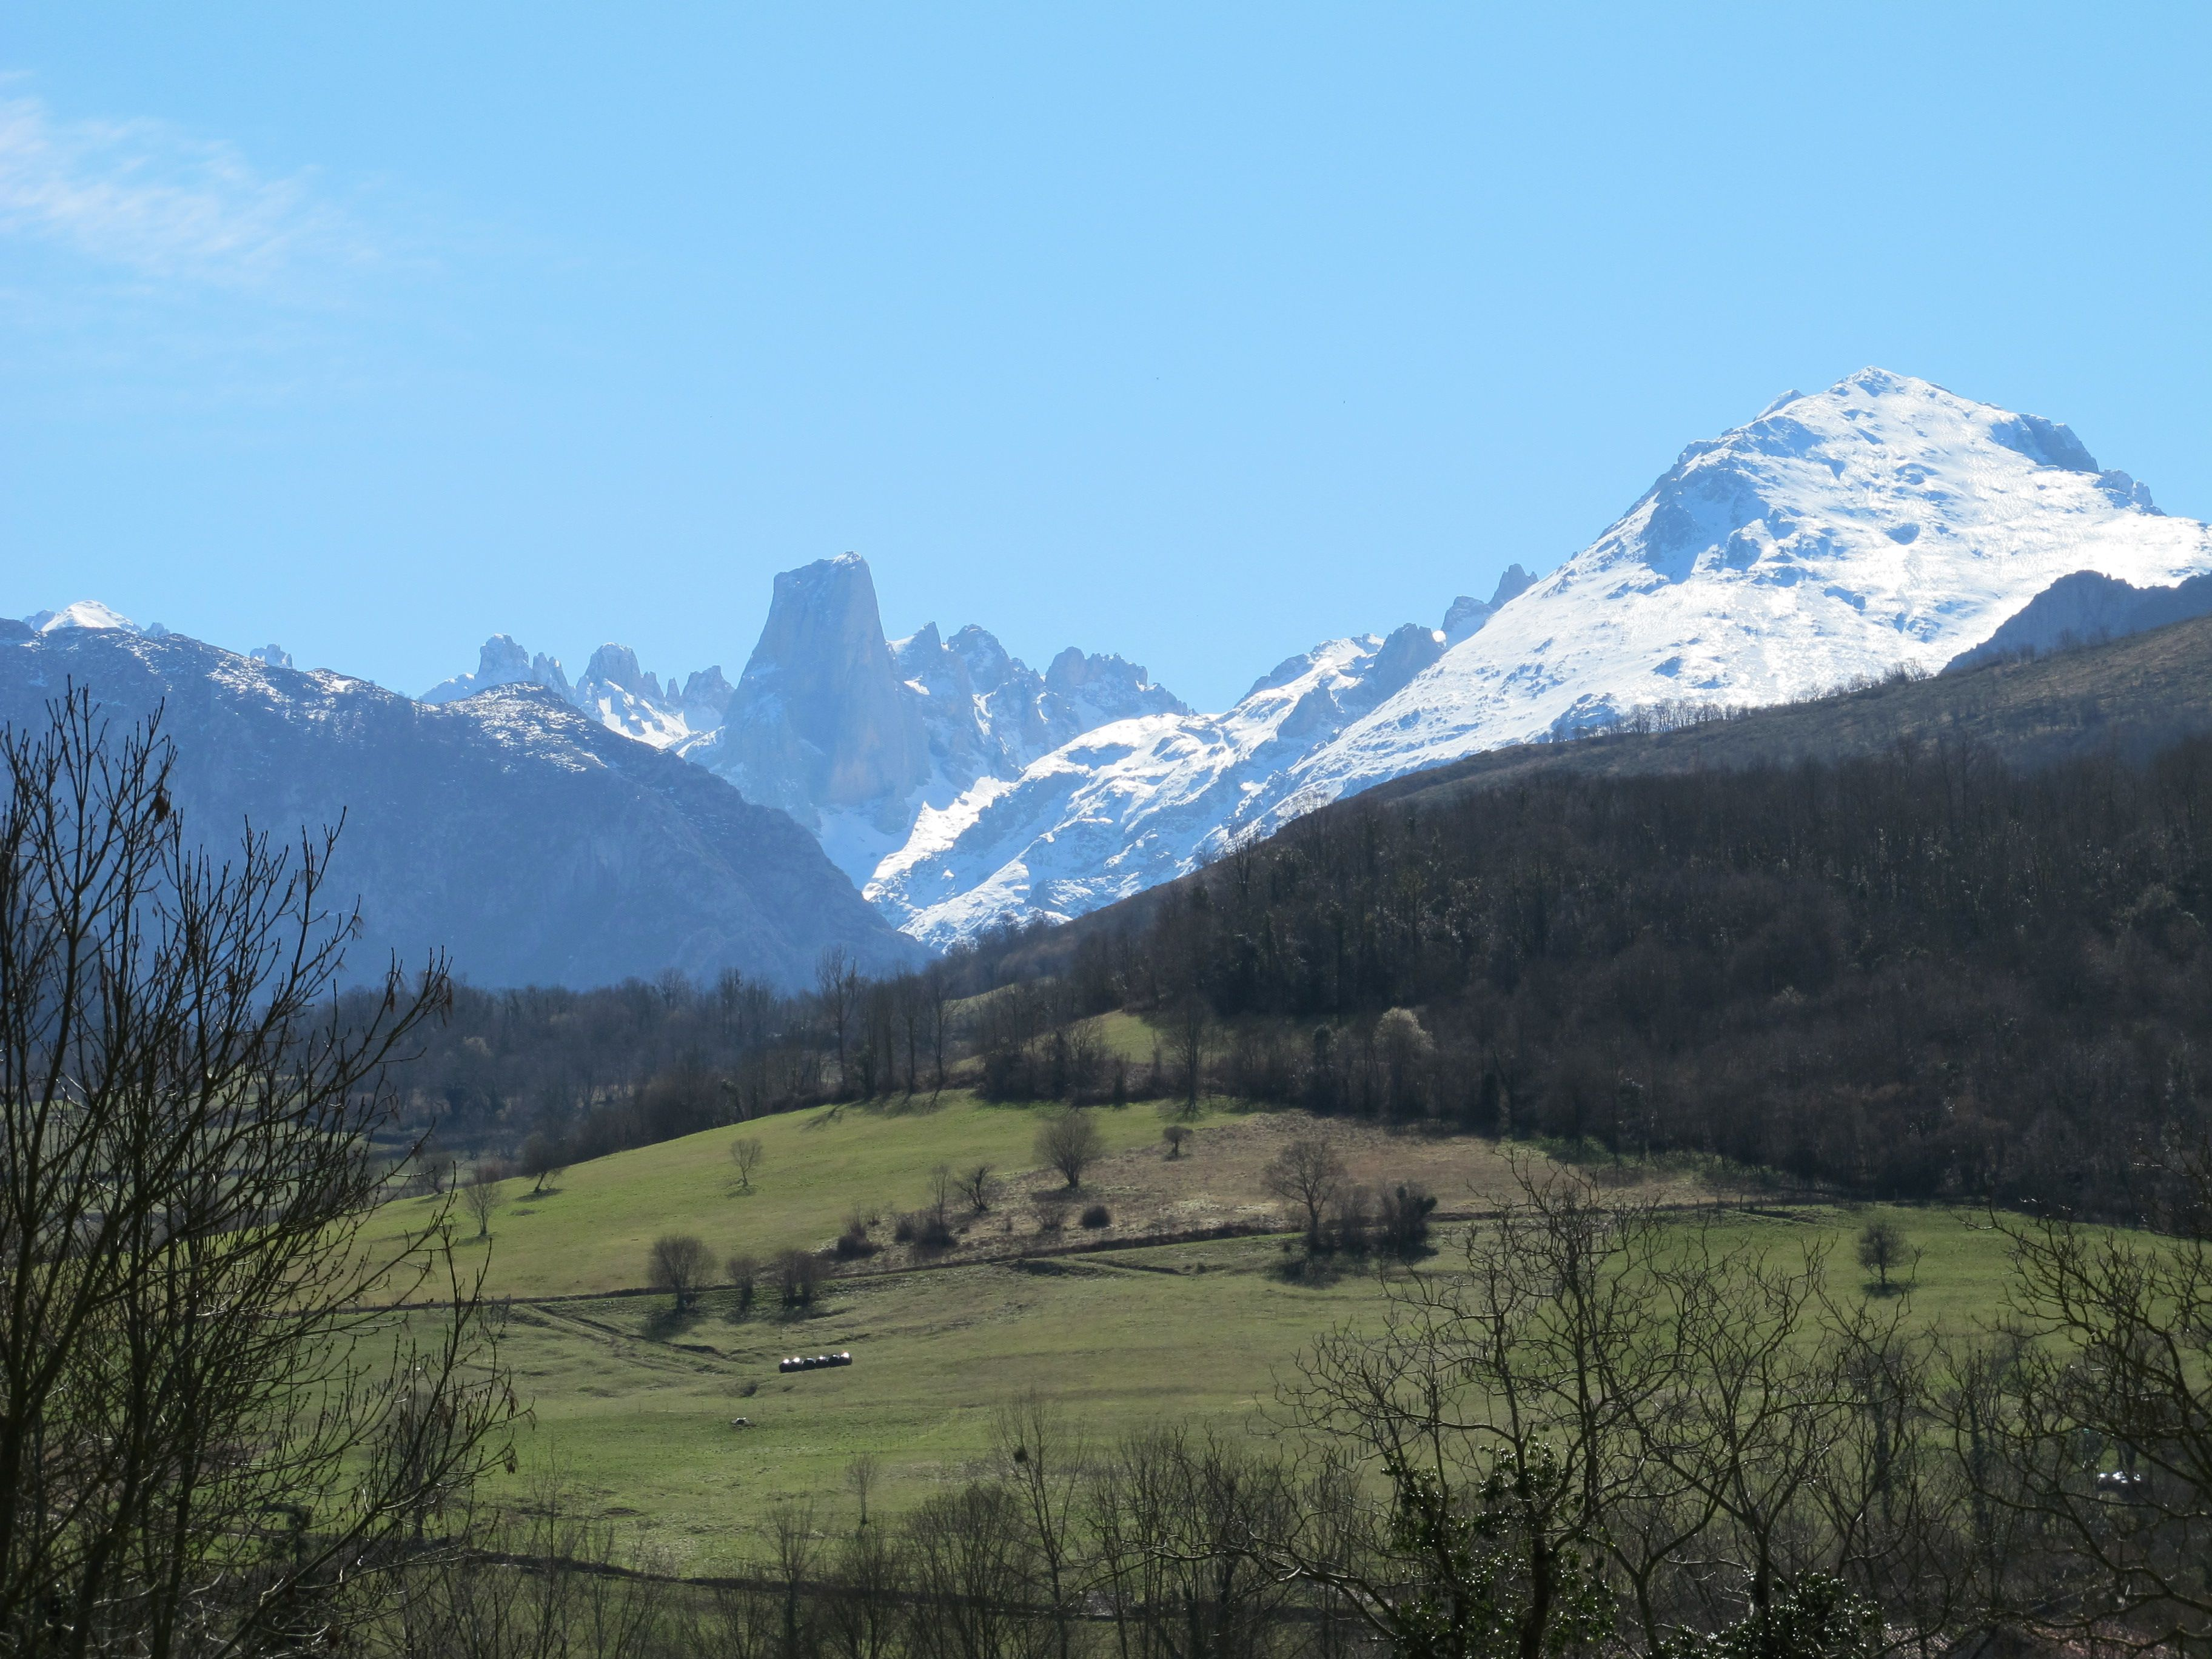 View Picos de Europa from La montaña mágica, Asturias.